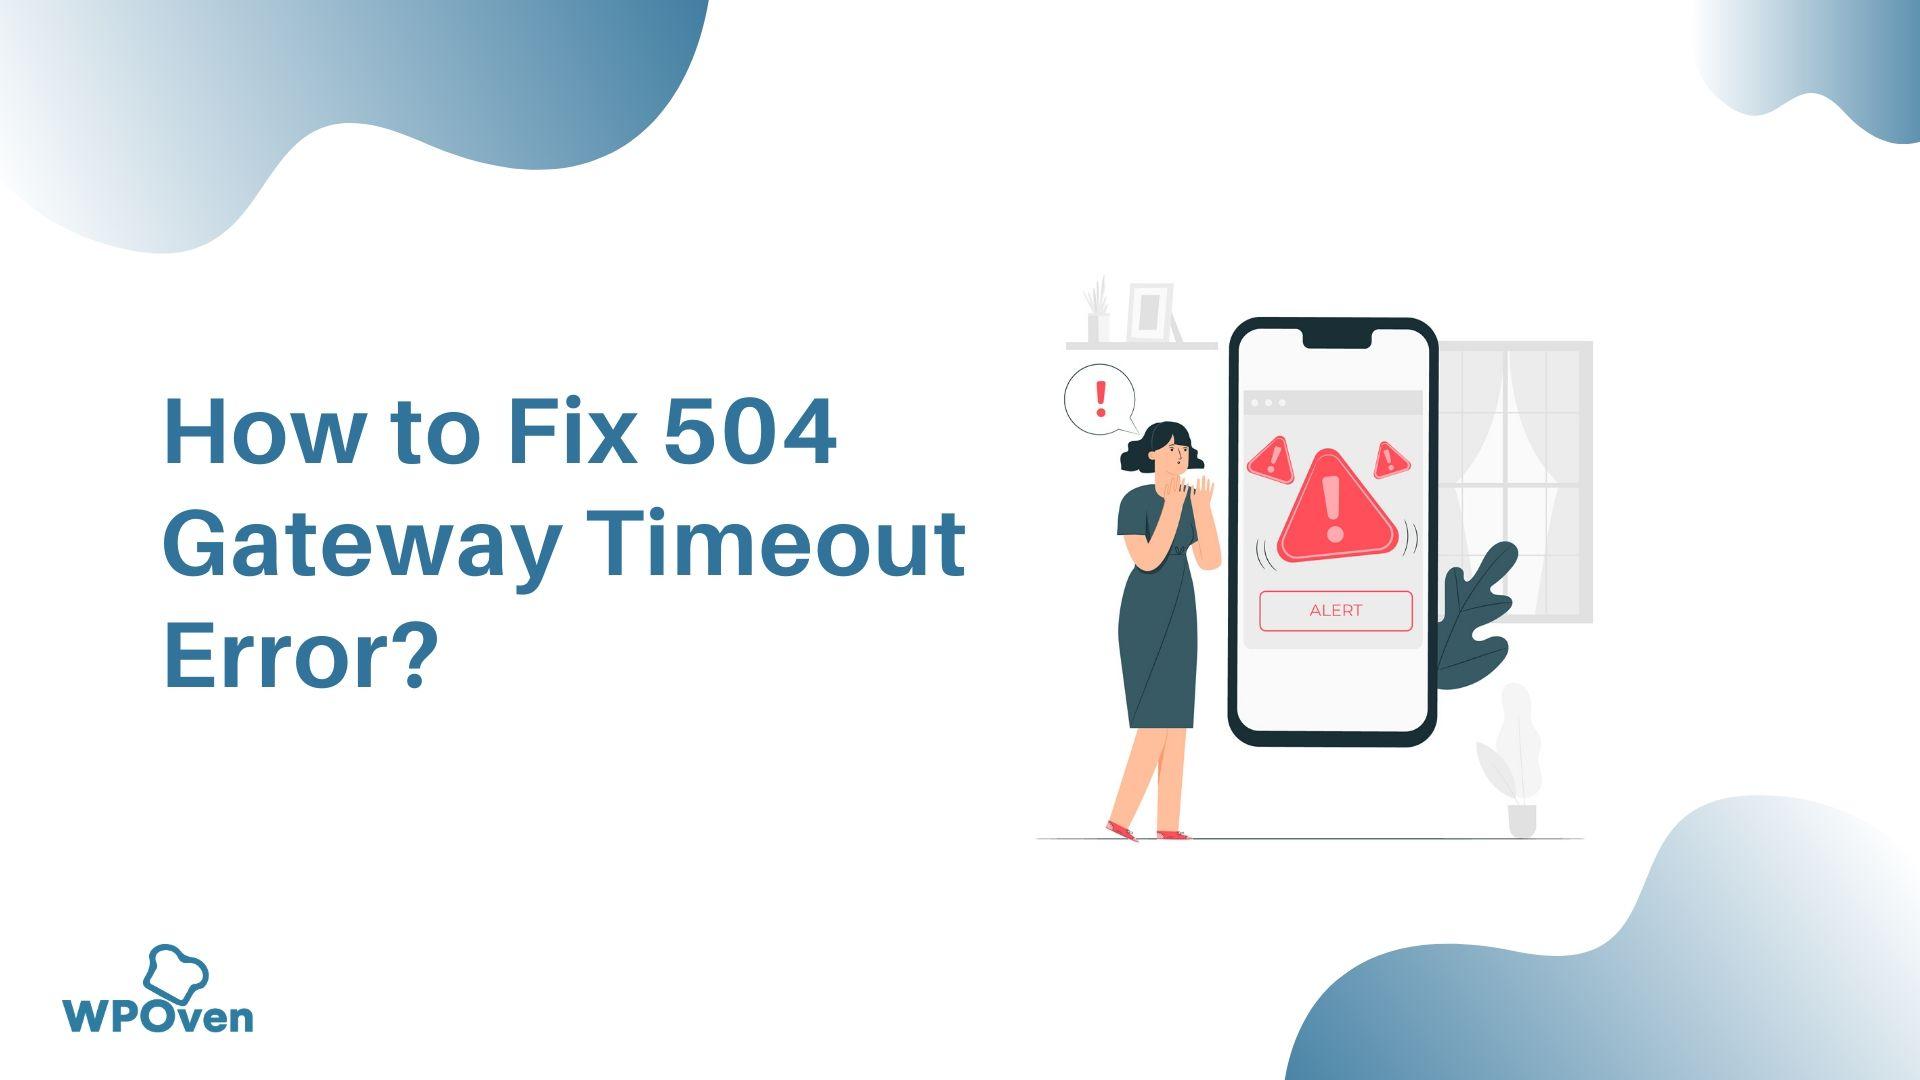 504 Gateway Timeout Error